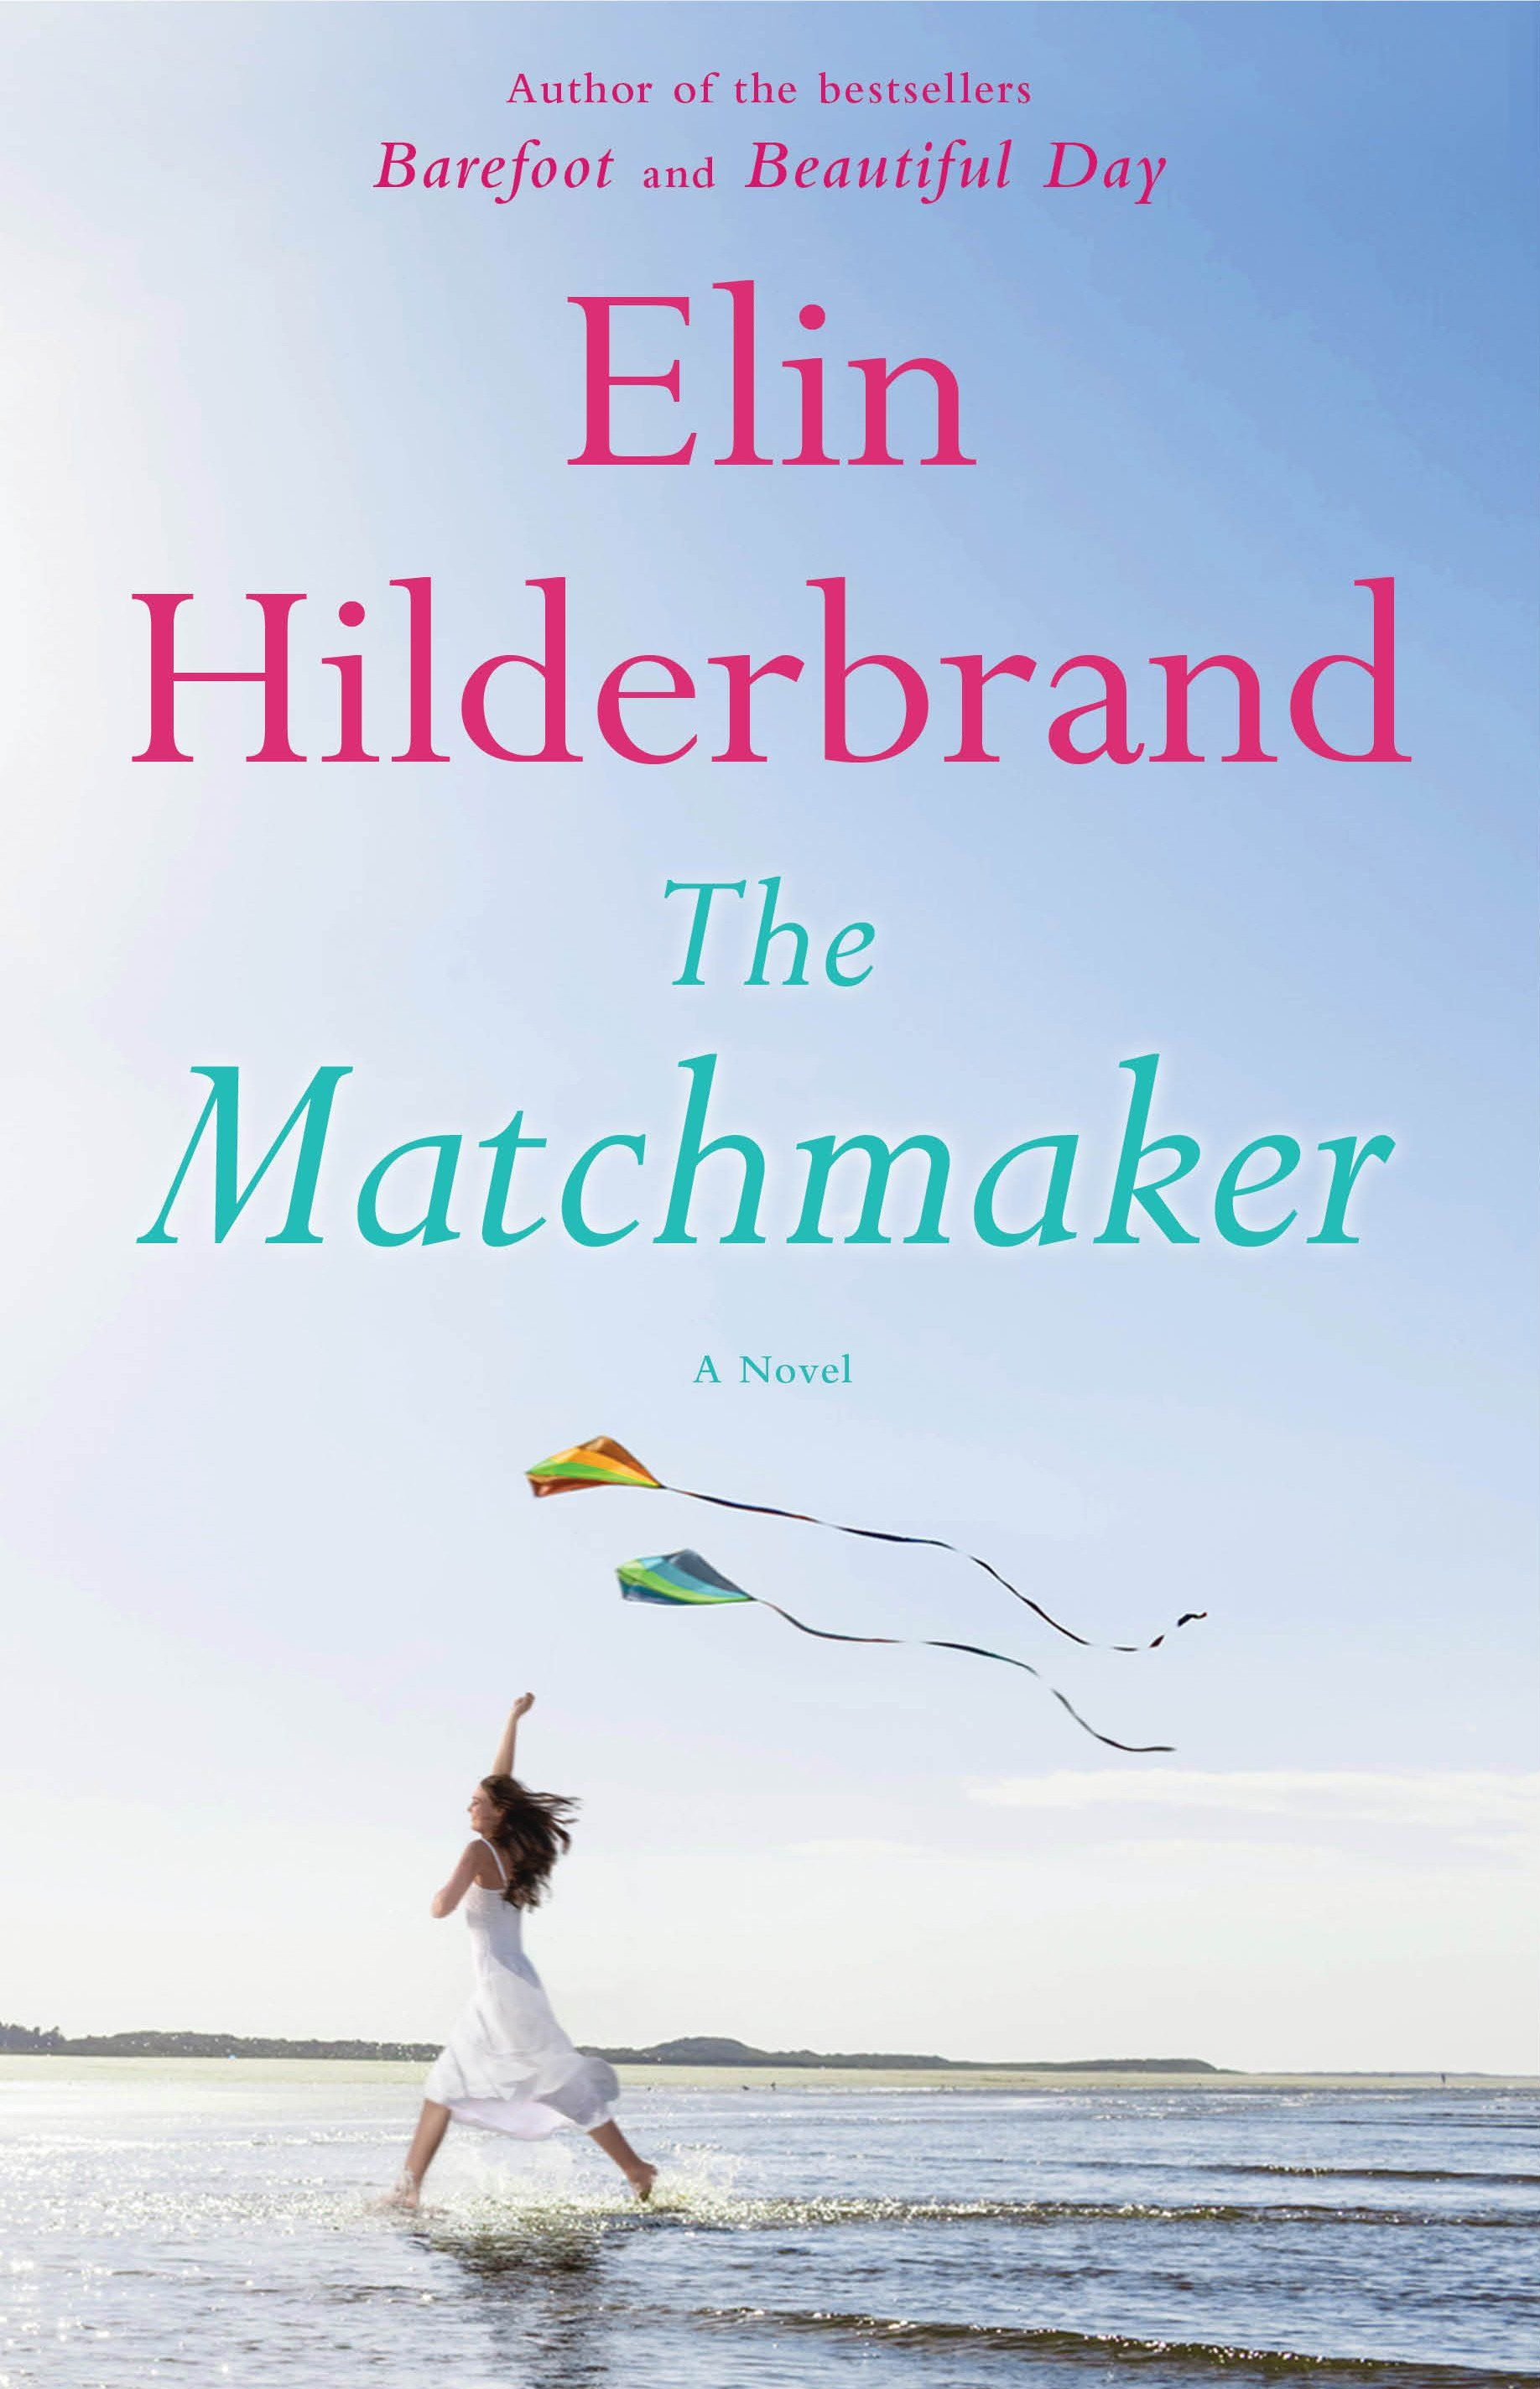 The Matchmaker Beach reading, Best books of 2014, Good books